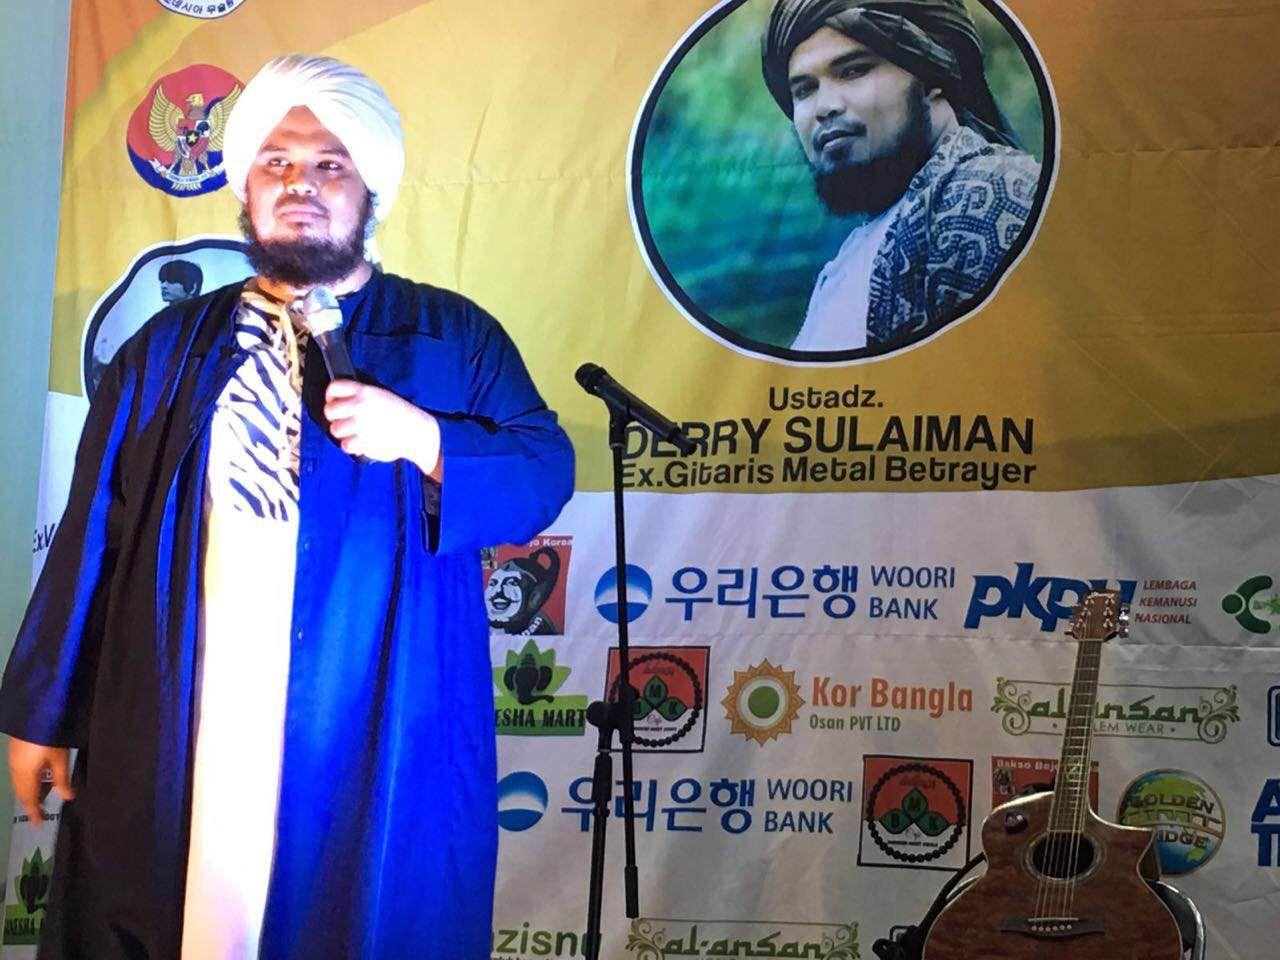 Foto: M Aji Surya/detikcom